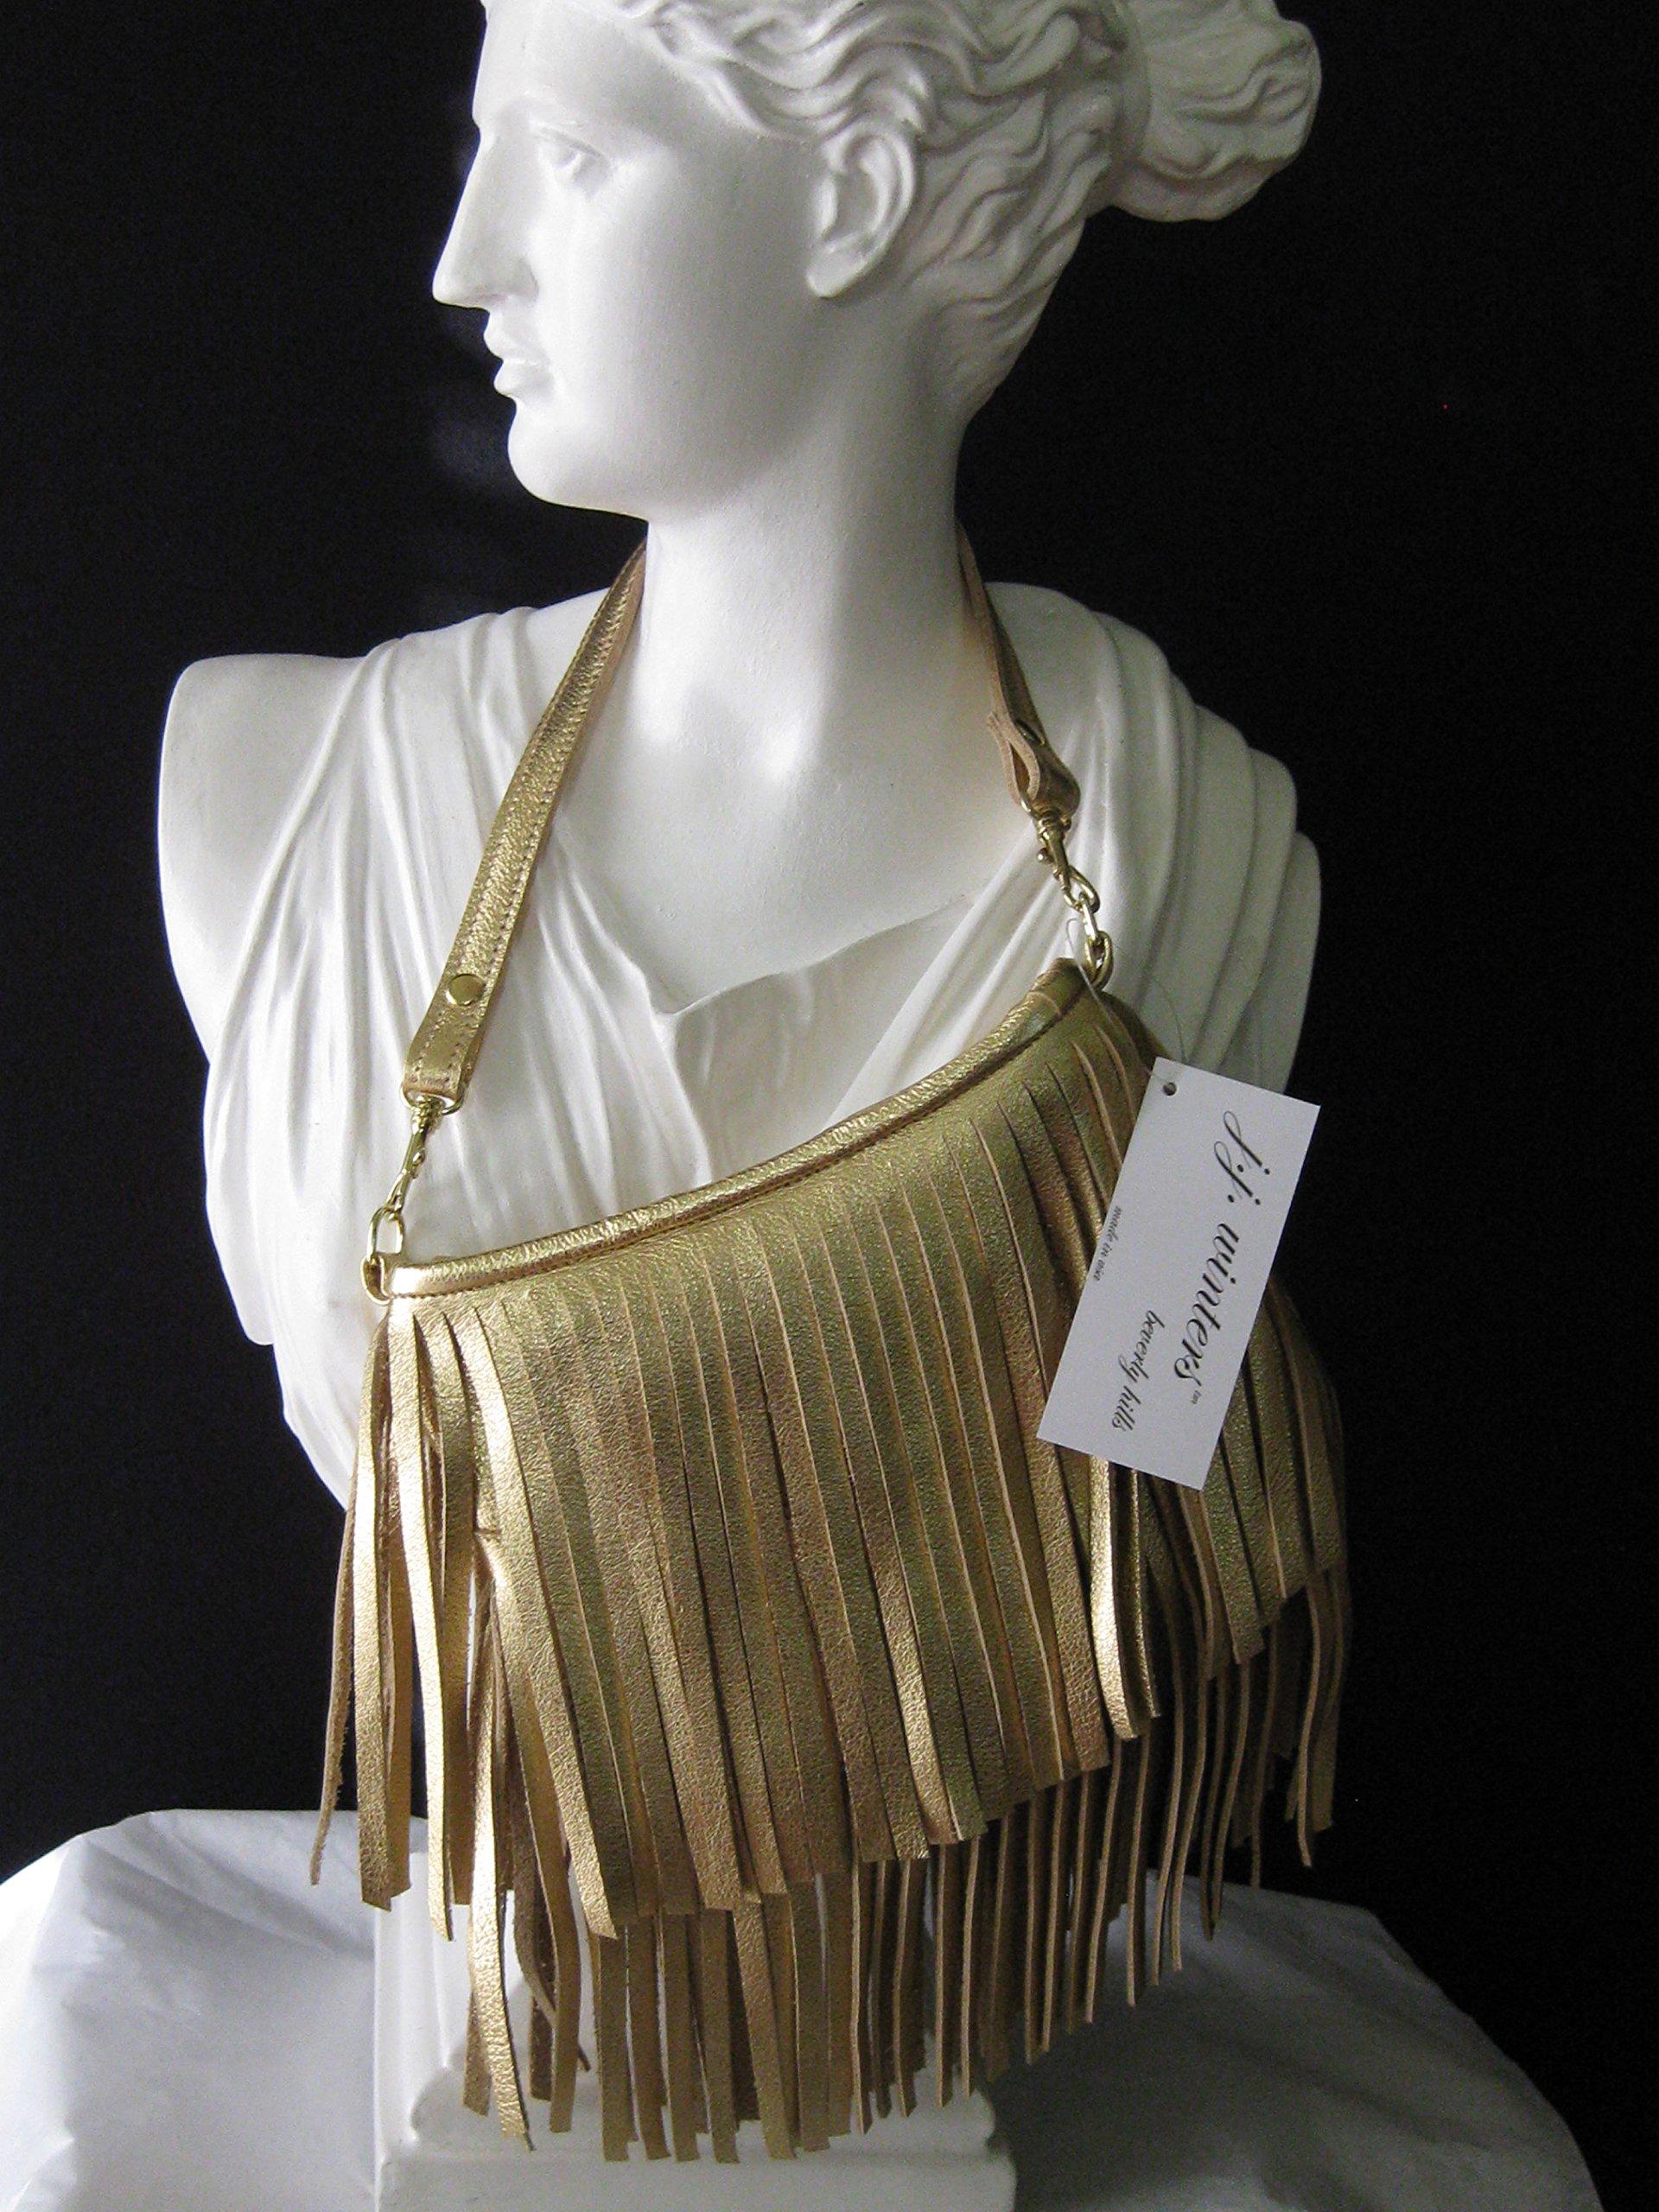 J. J. Winters Vanessa Mini Gold Metallic Leather Women's Fringe Handbag Purse